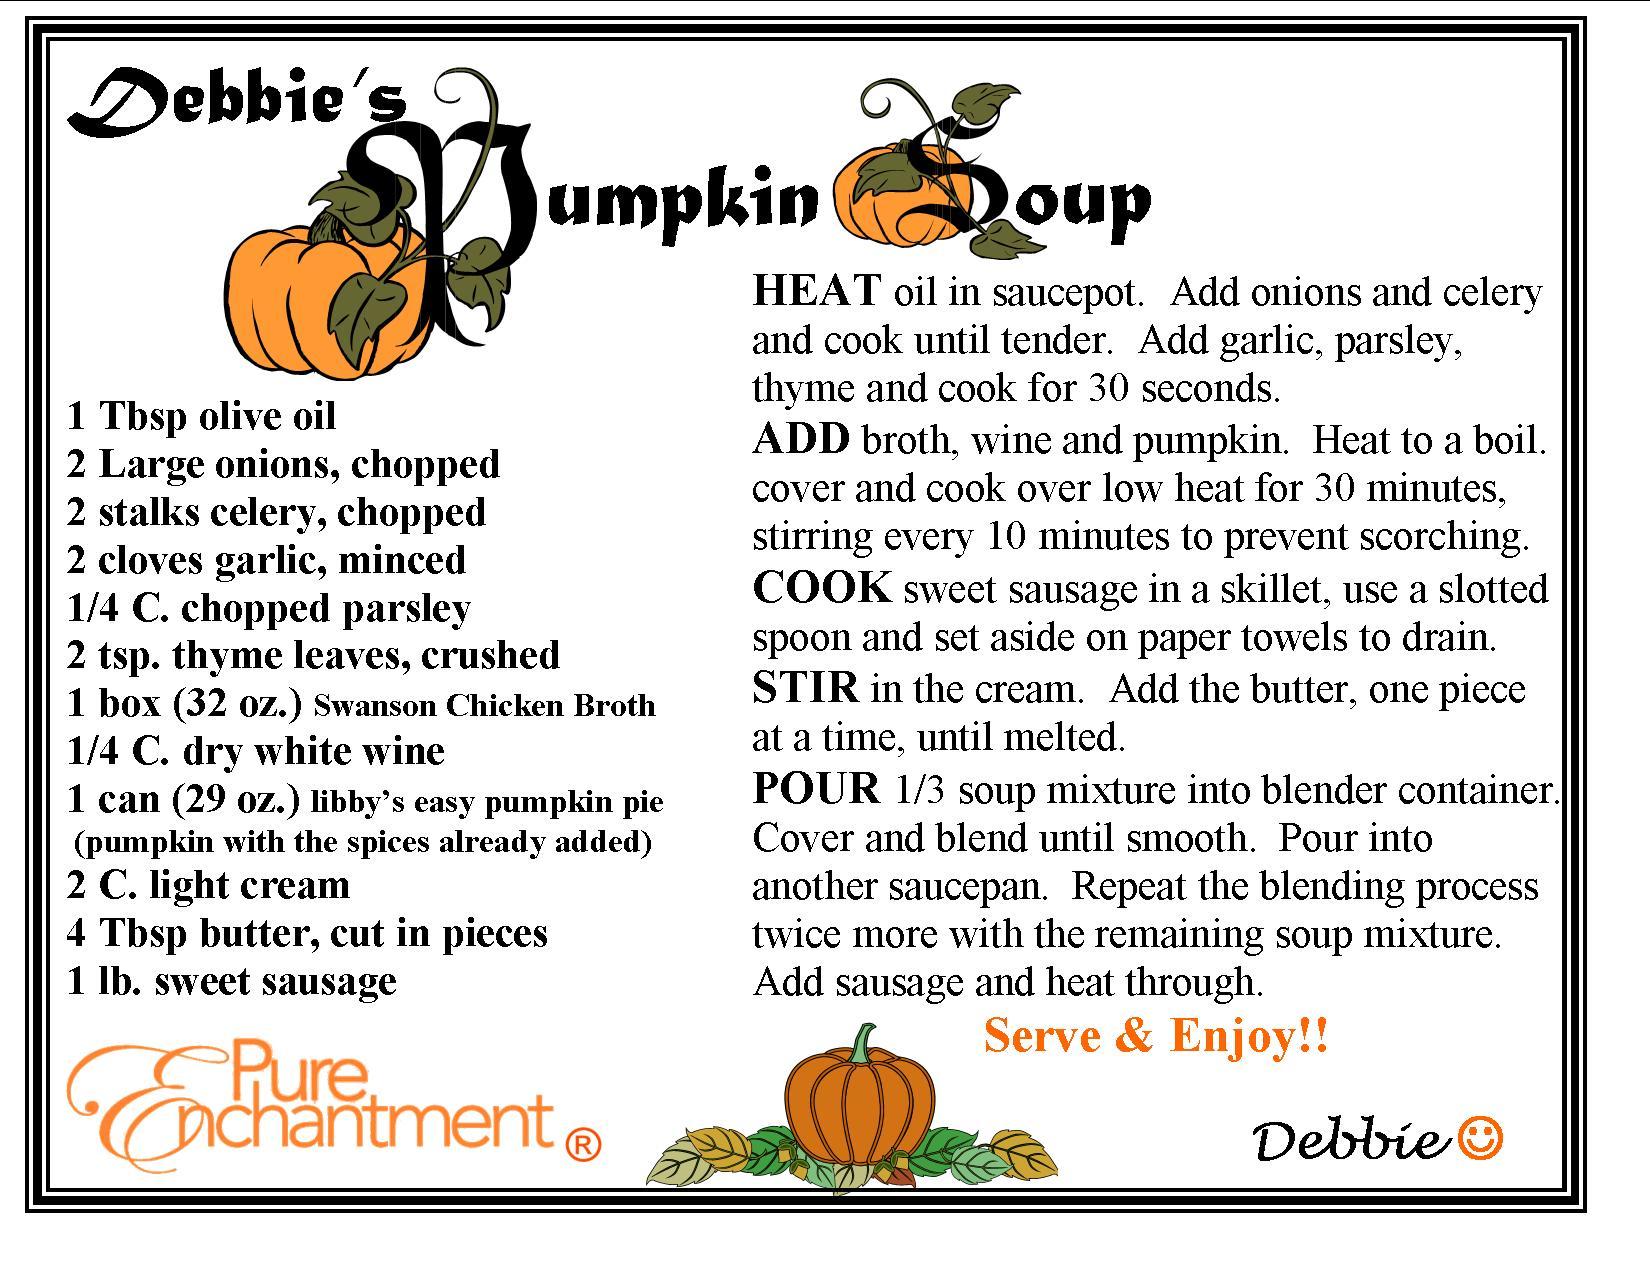 pumpkin soup recipe.jpg